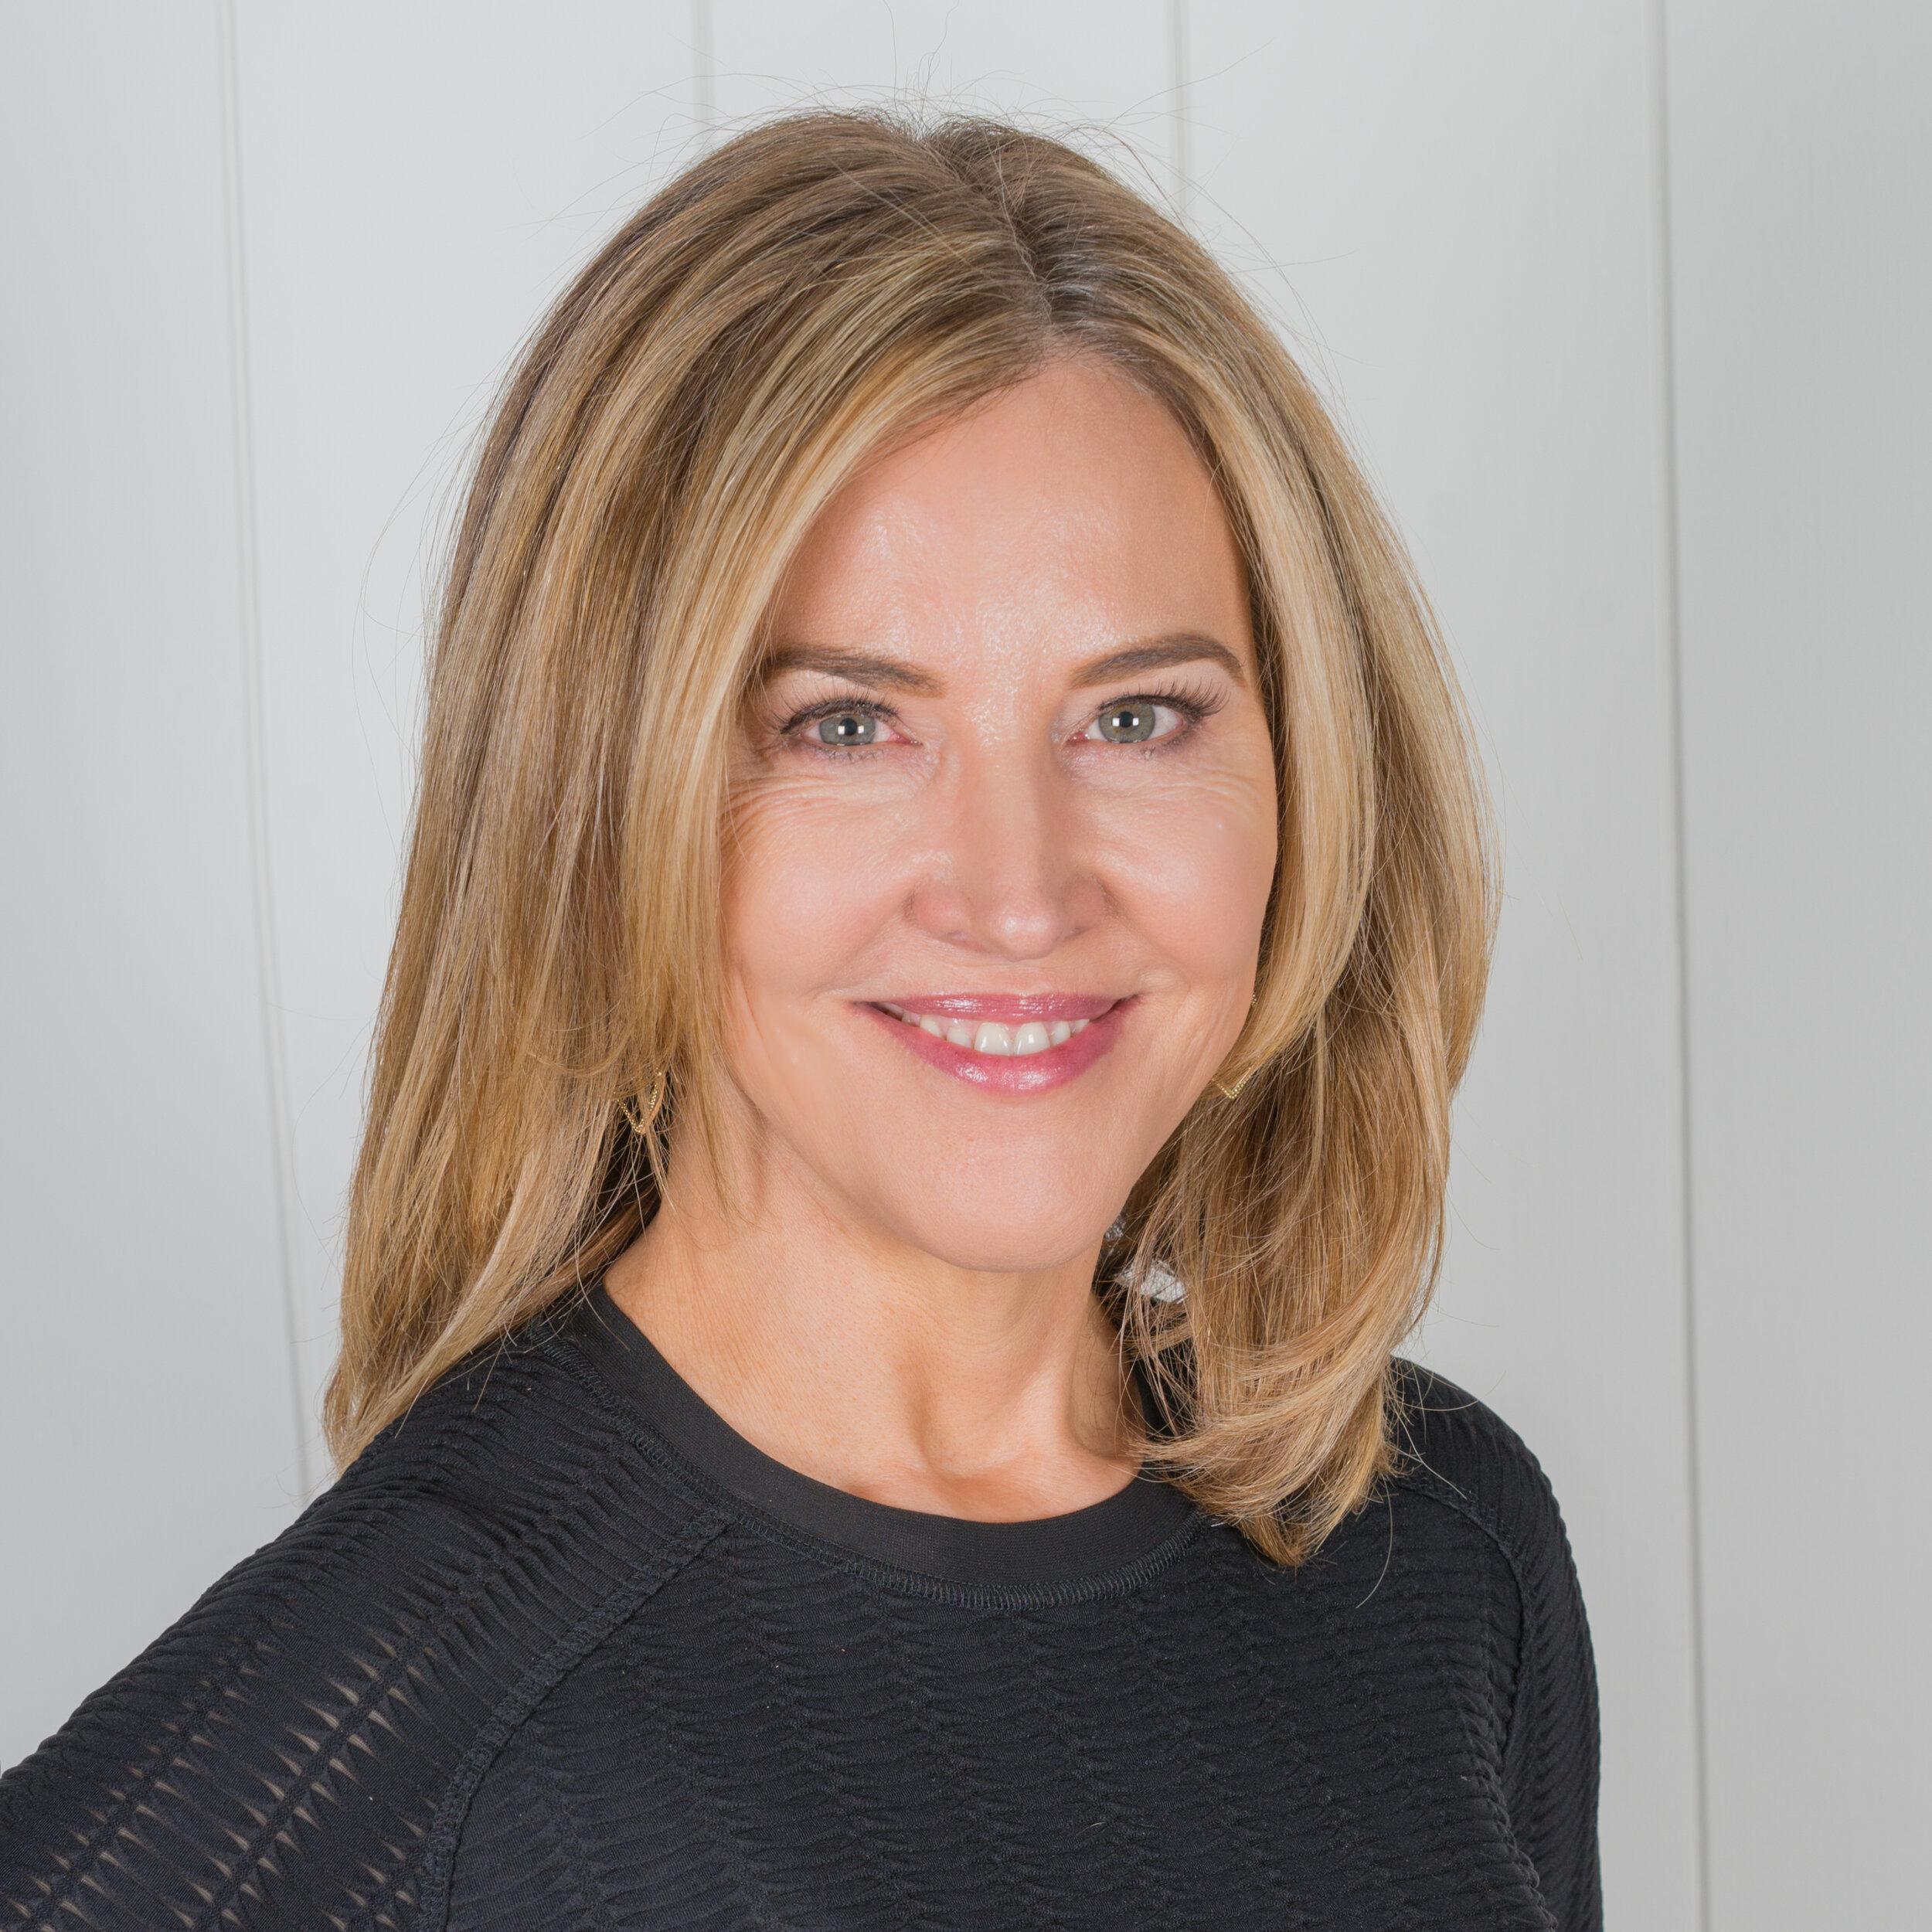 Lynn Heublein, CEO & Co-Founder of SkinSpirit